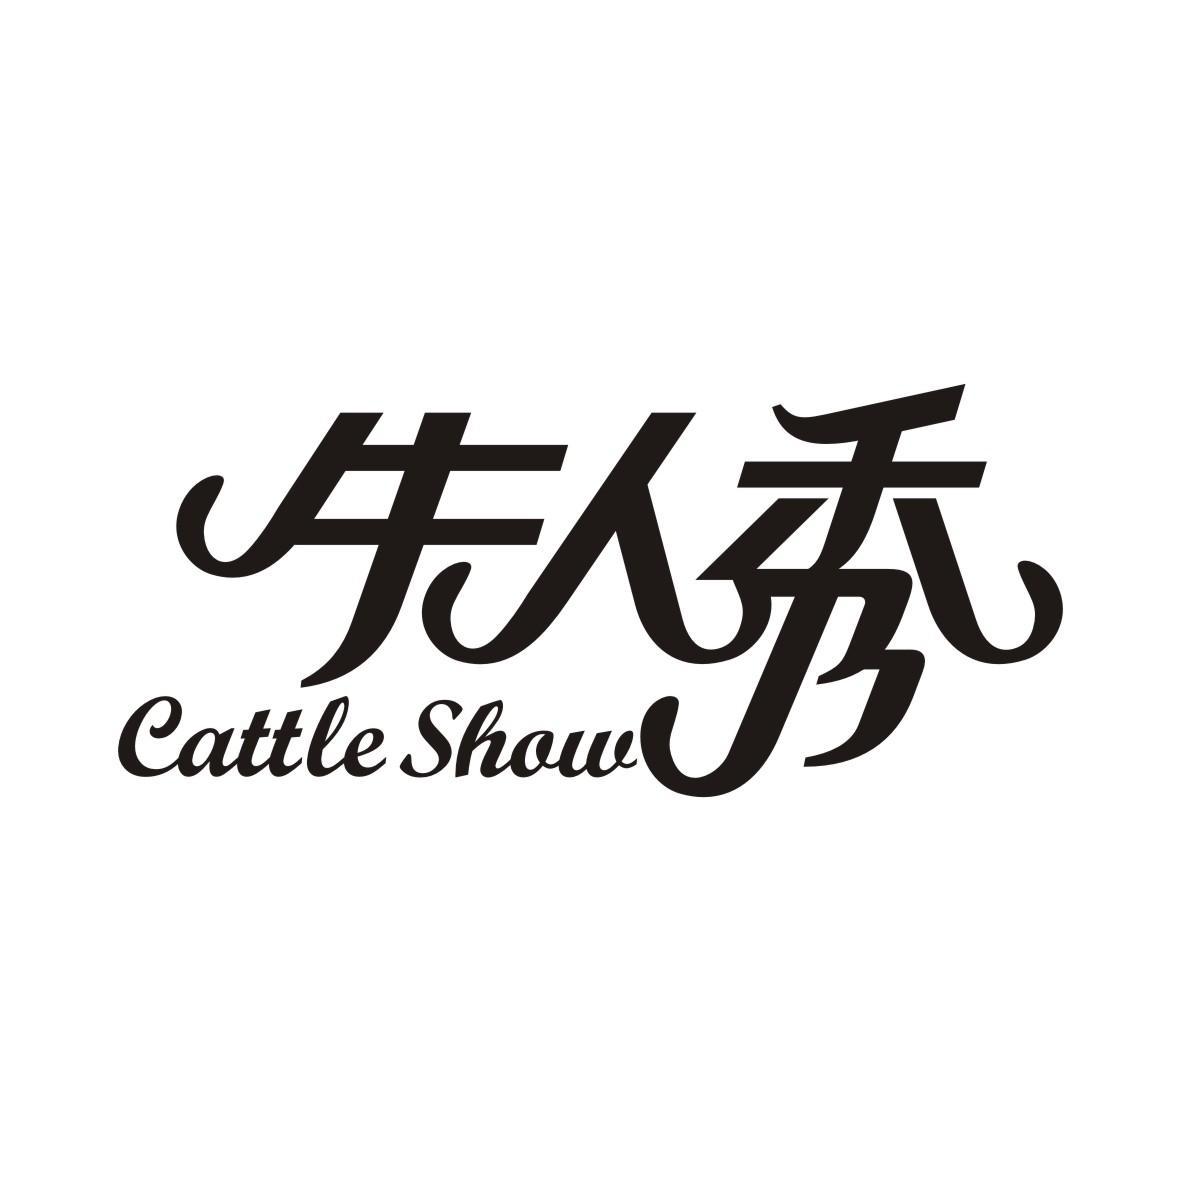 转让商标-牛人秀 CATTLE SHOW